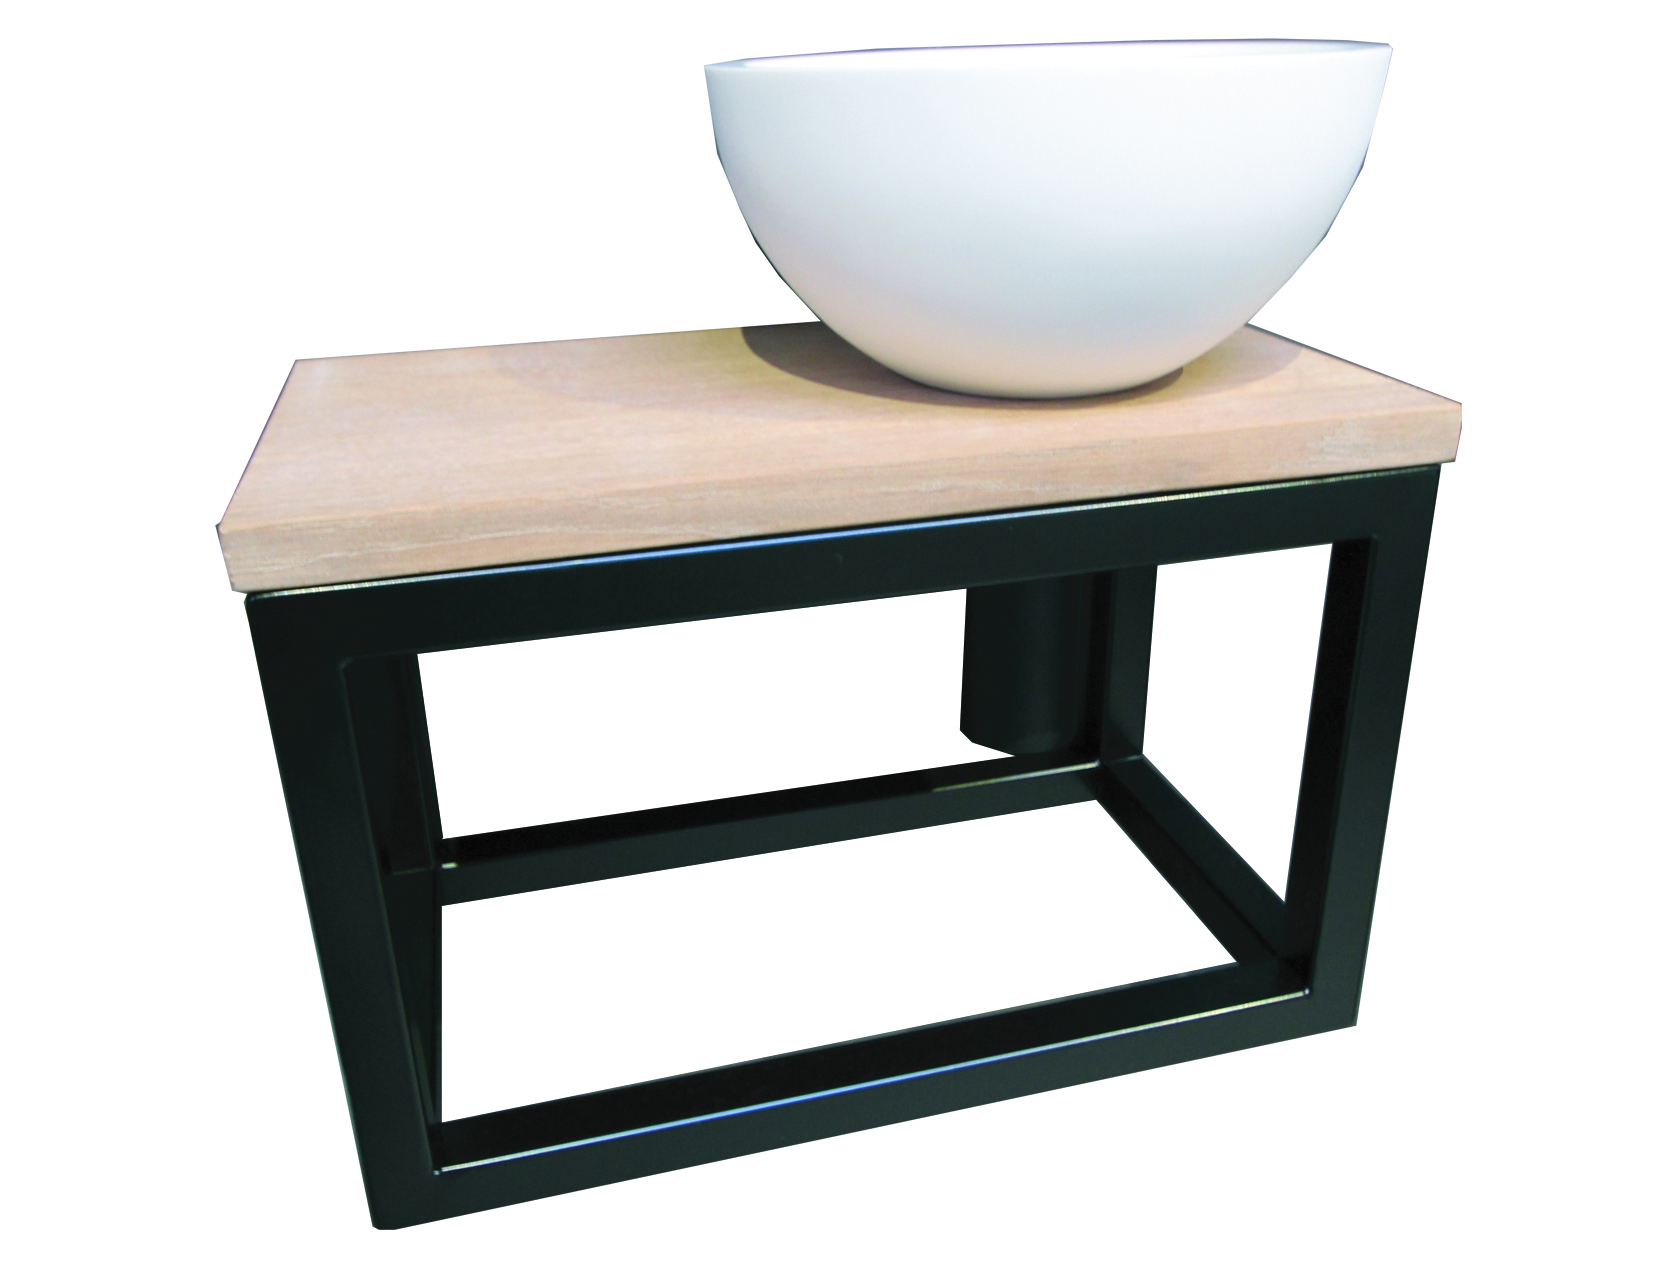 Luca Sanitair Steel Frame fonteinset met mat witte opzetkom 40 x 22 x 25 cm, zwart